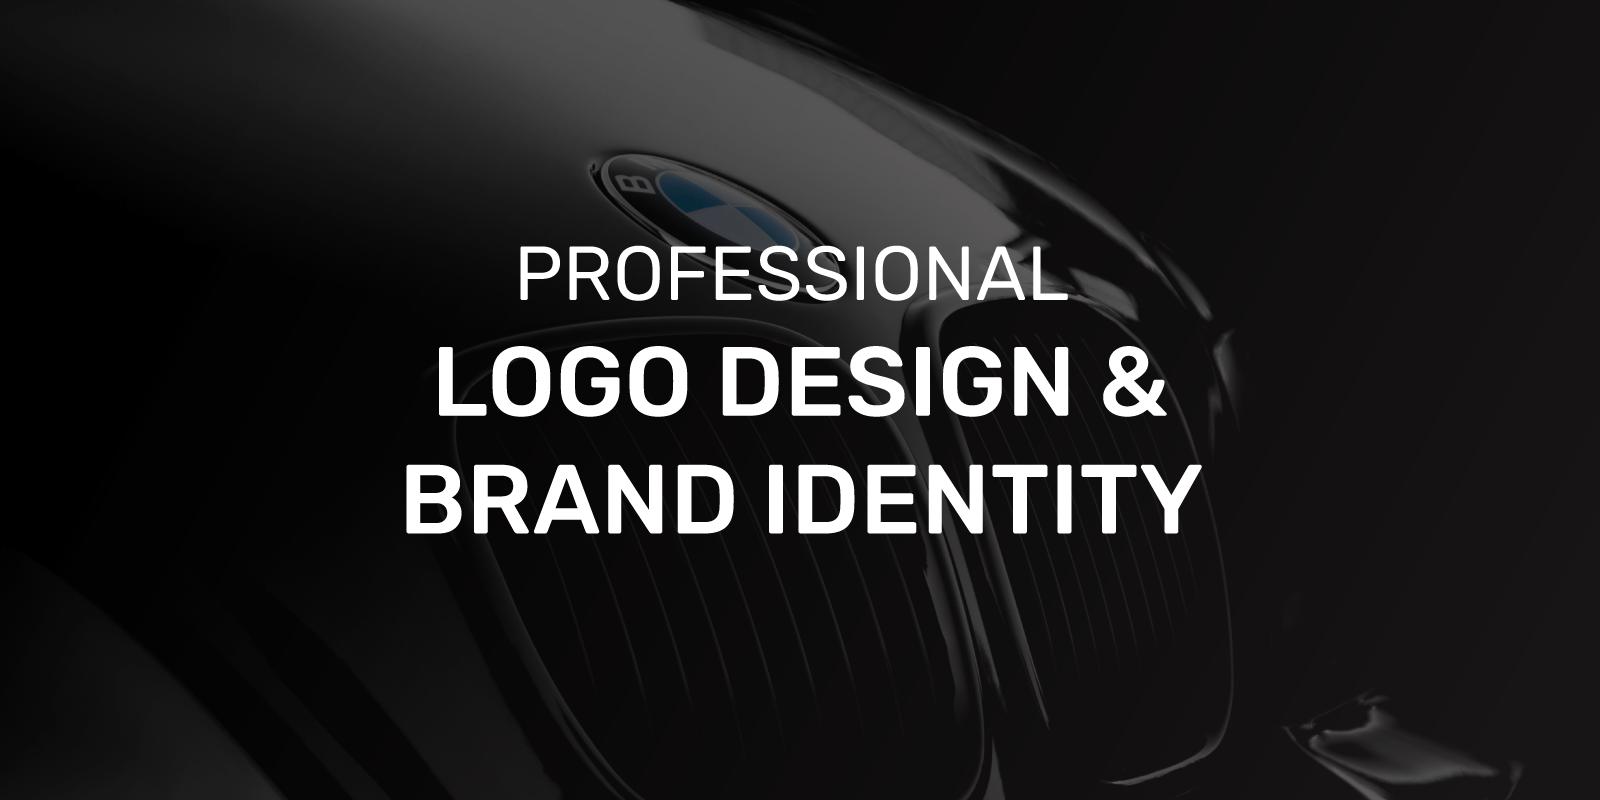 Professional Logo Design & Brand Identity